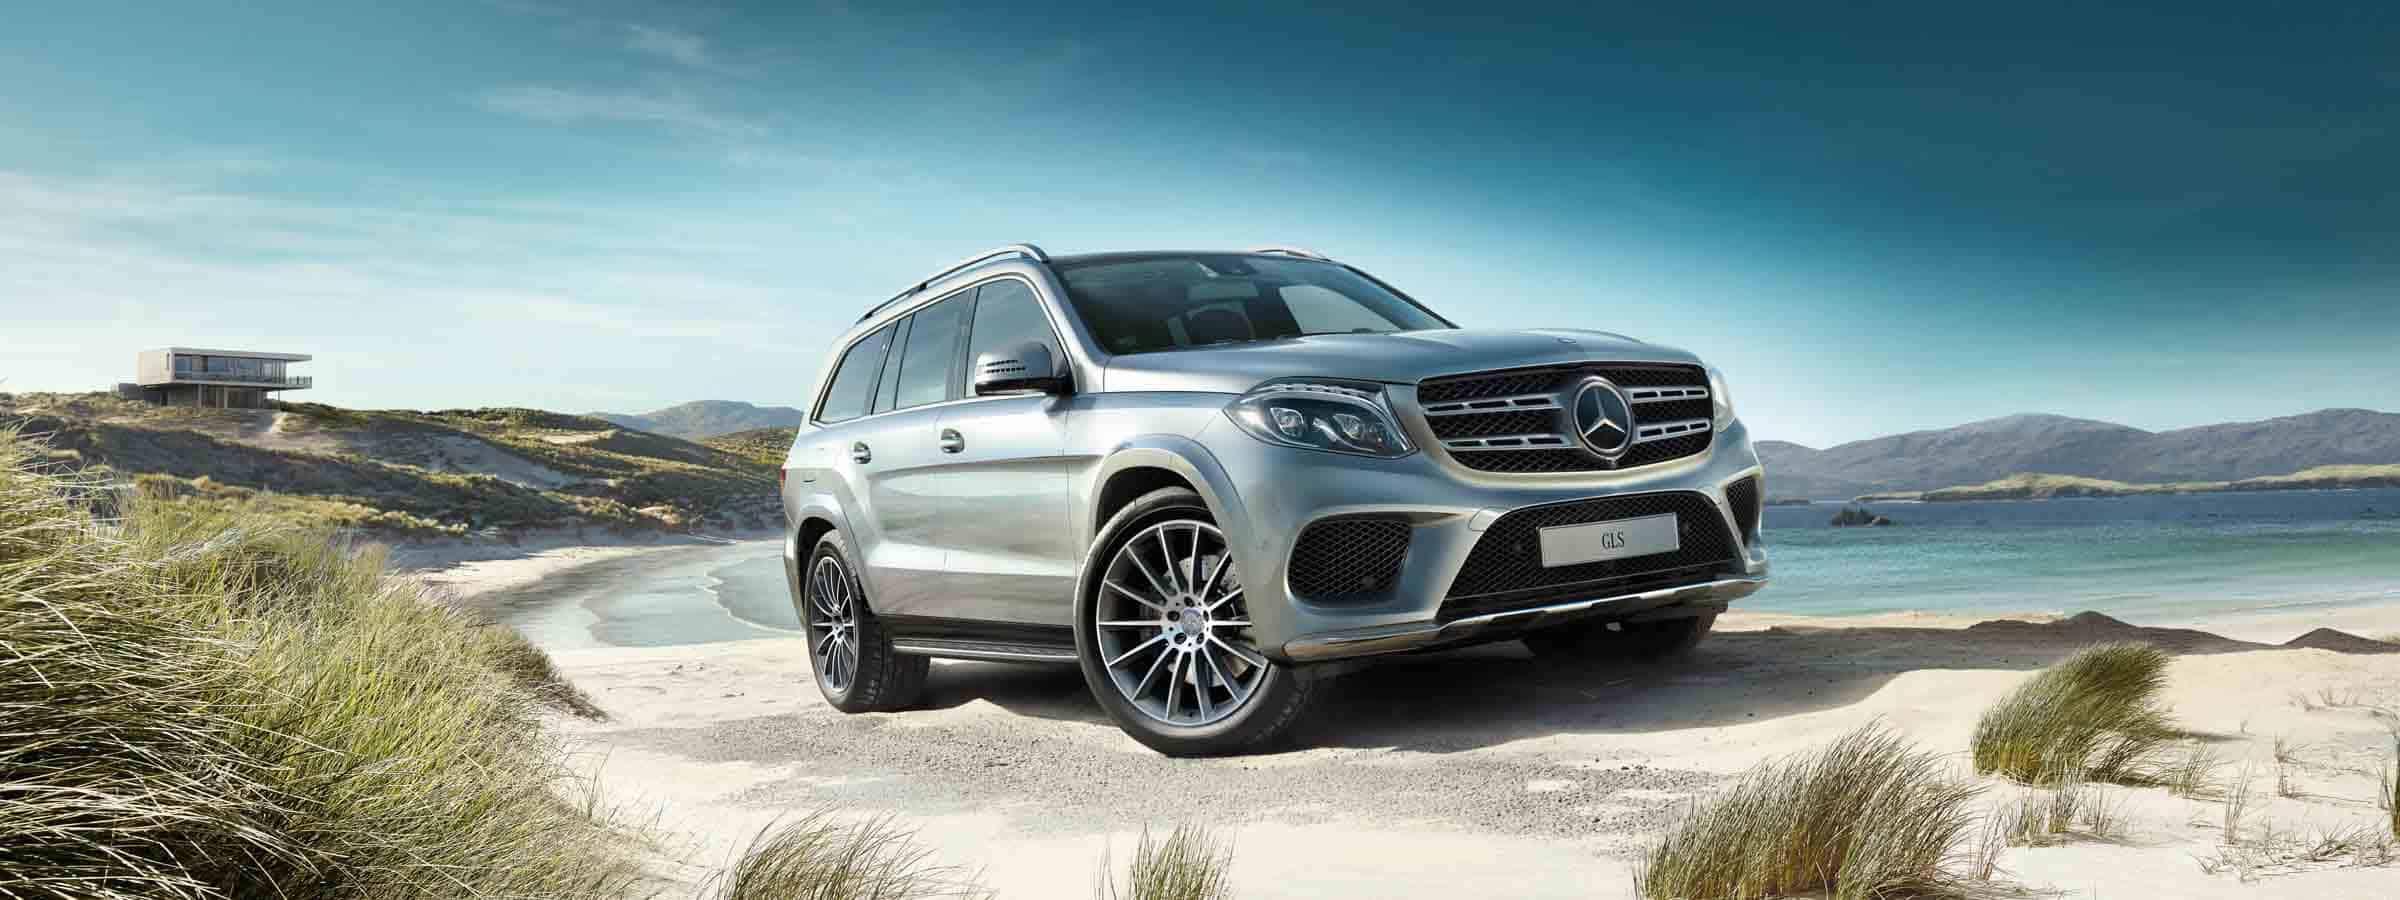 OFFROOT, Mercedes Benz, MERCEDES – BENZ GLS –SUV, GLS 350D - review-xe - ĐÁNH GIÁ XE MERCEDES – BENZ GLS –SUV